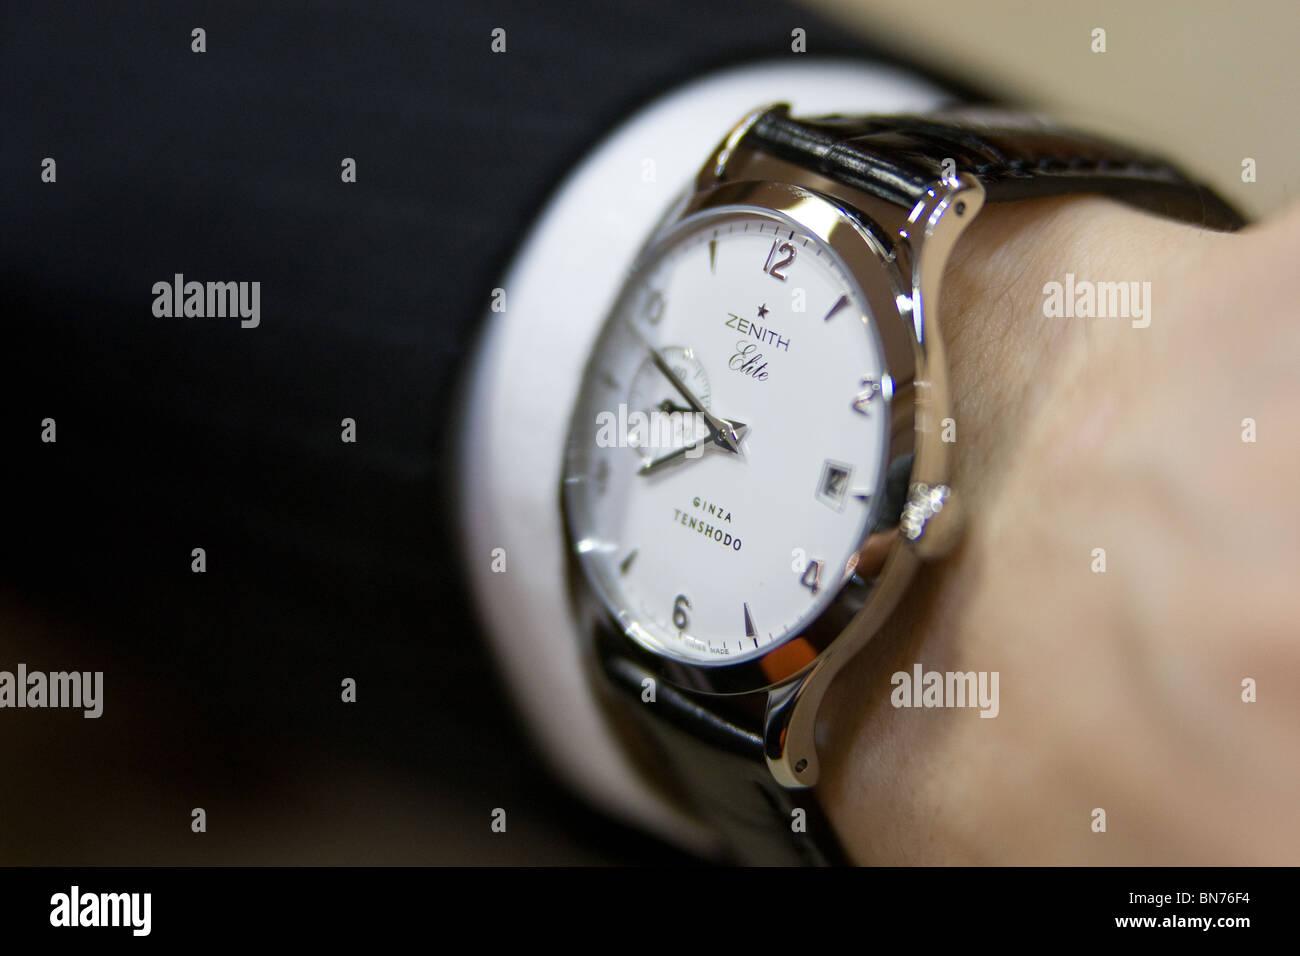 The Zenith Elite Tenshodo Limited Edition watch- costing ¥535,000, in 'Tenshodo' shop, Ginza, Tokyo, - Stock Image